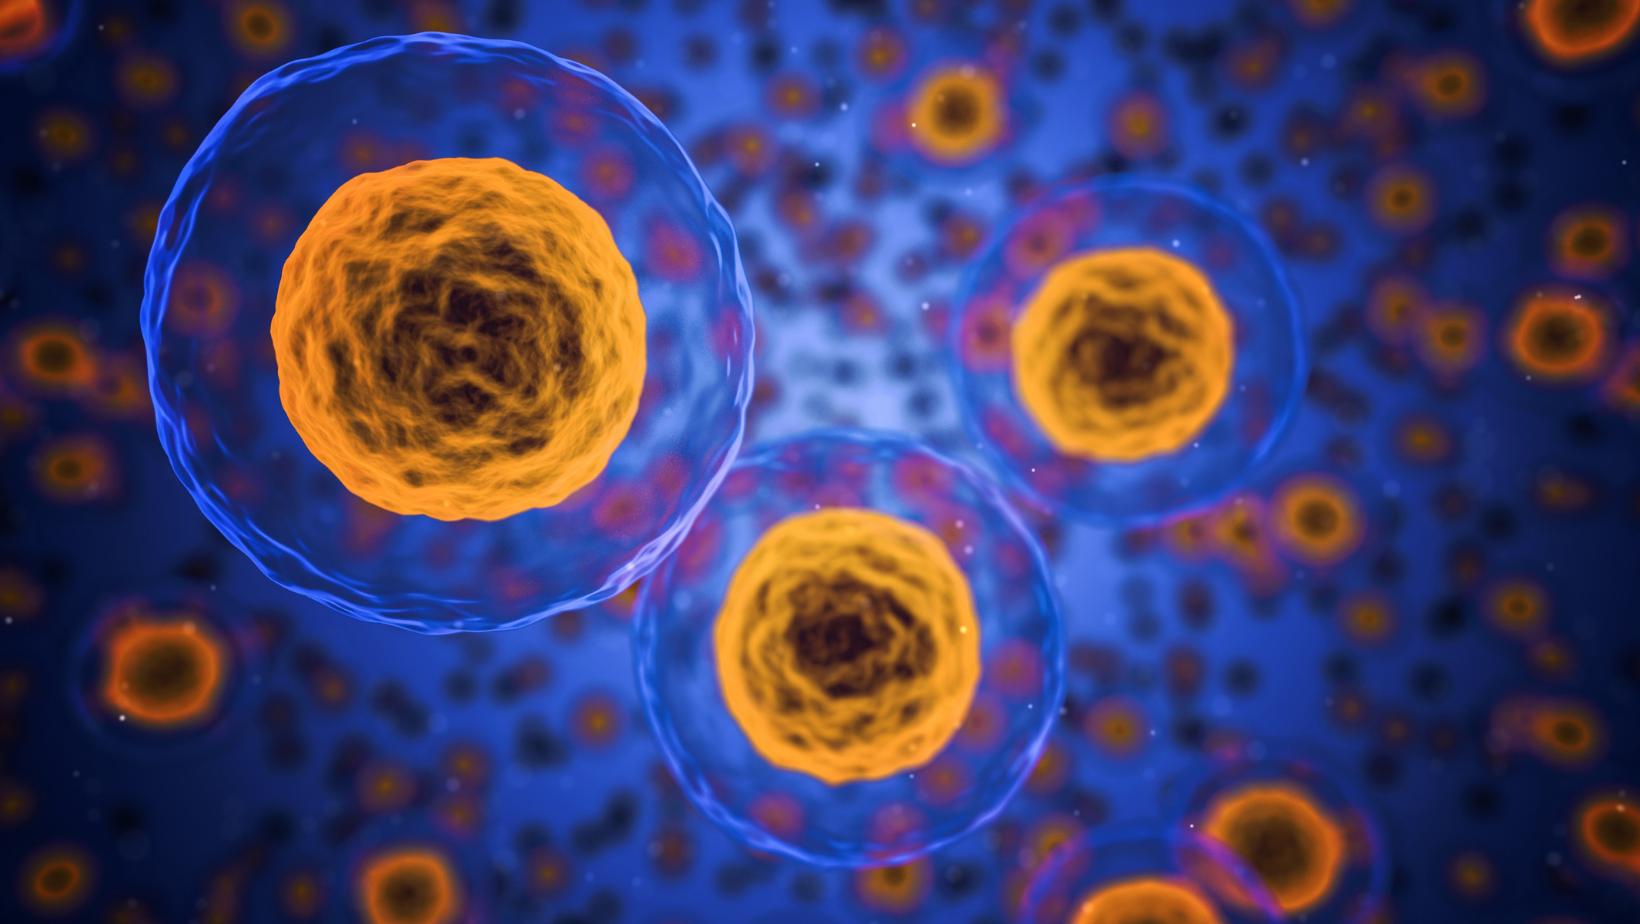 cellen, computer image